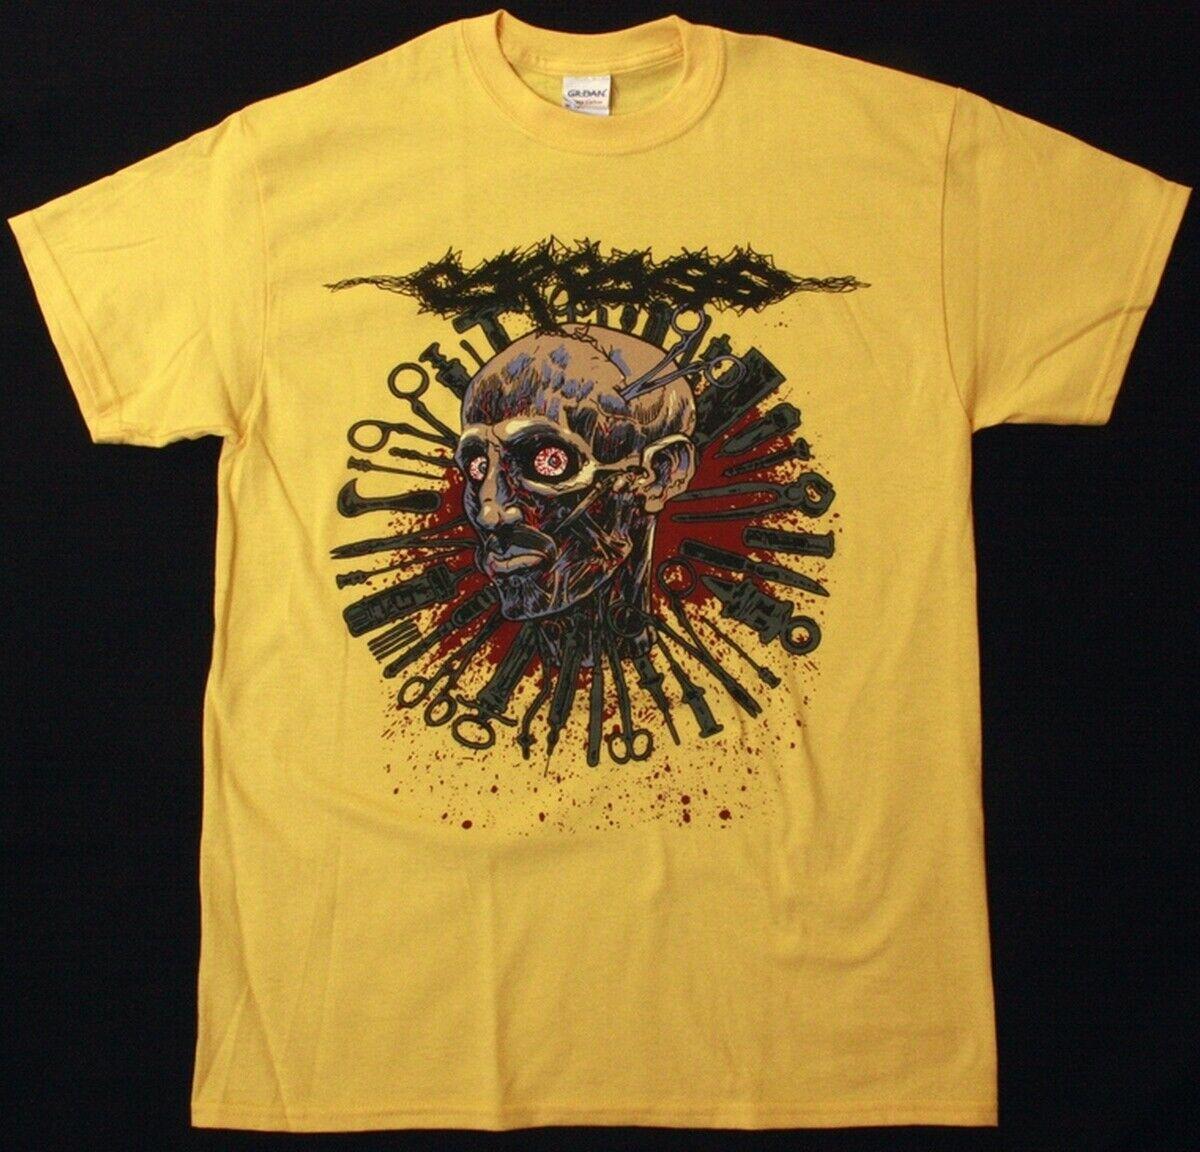 Carcass Head One Foot 2016 Tour Grindcore Death Metal, nueva camiseta amarilla